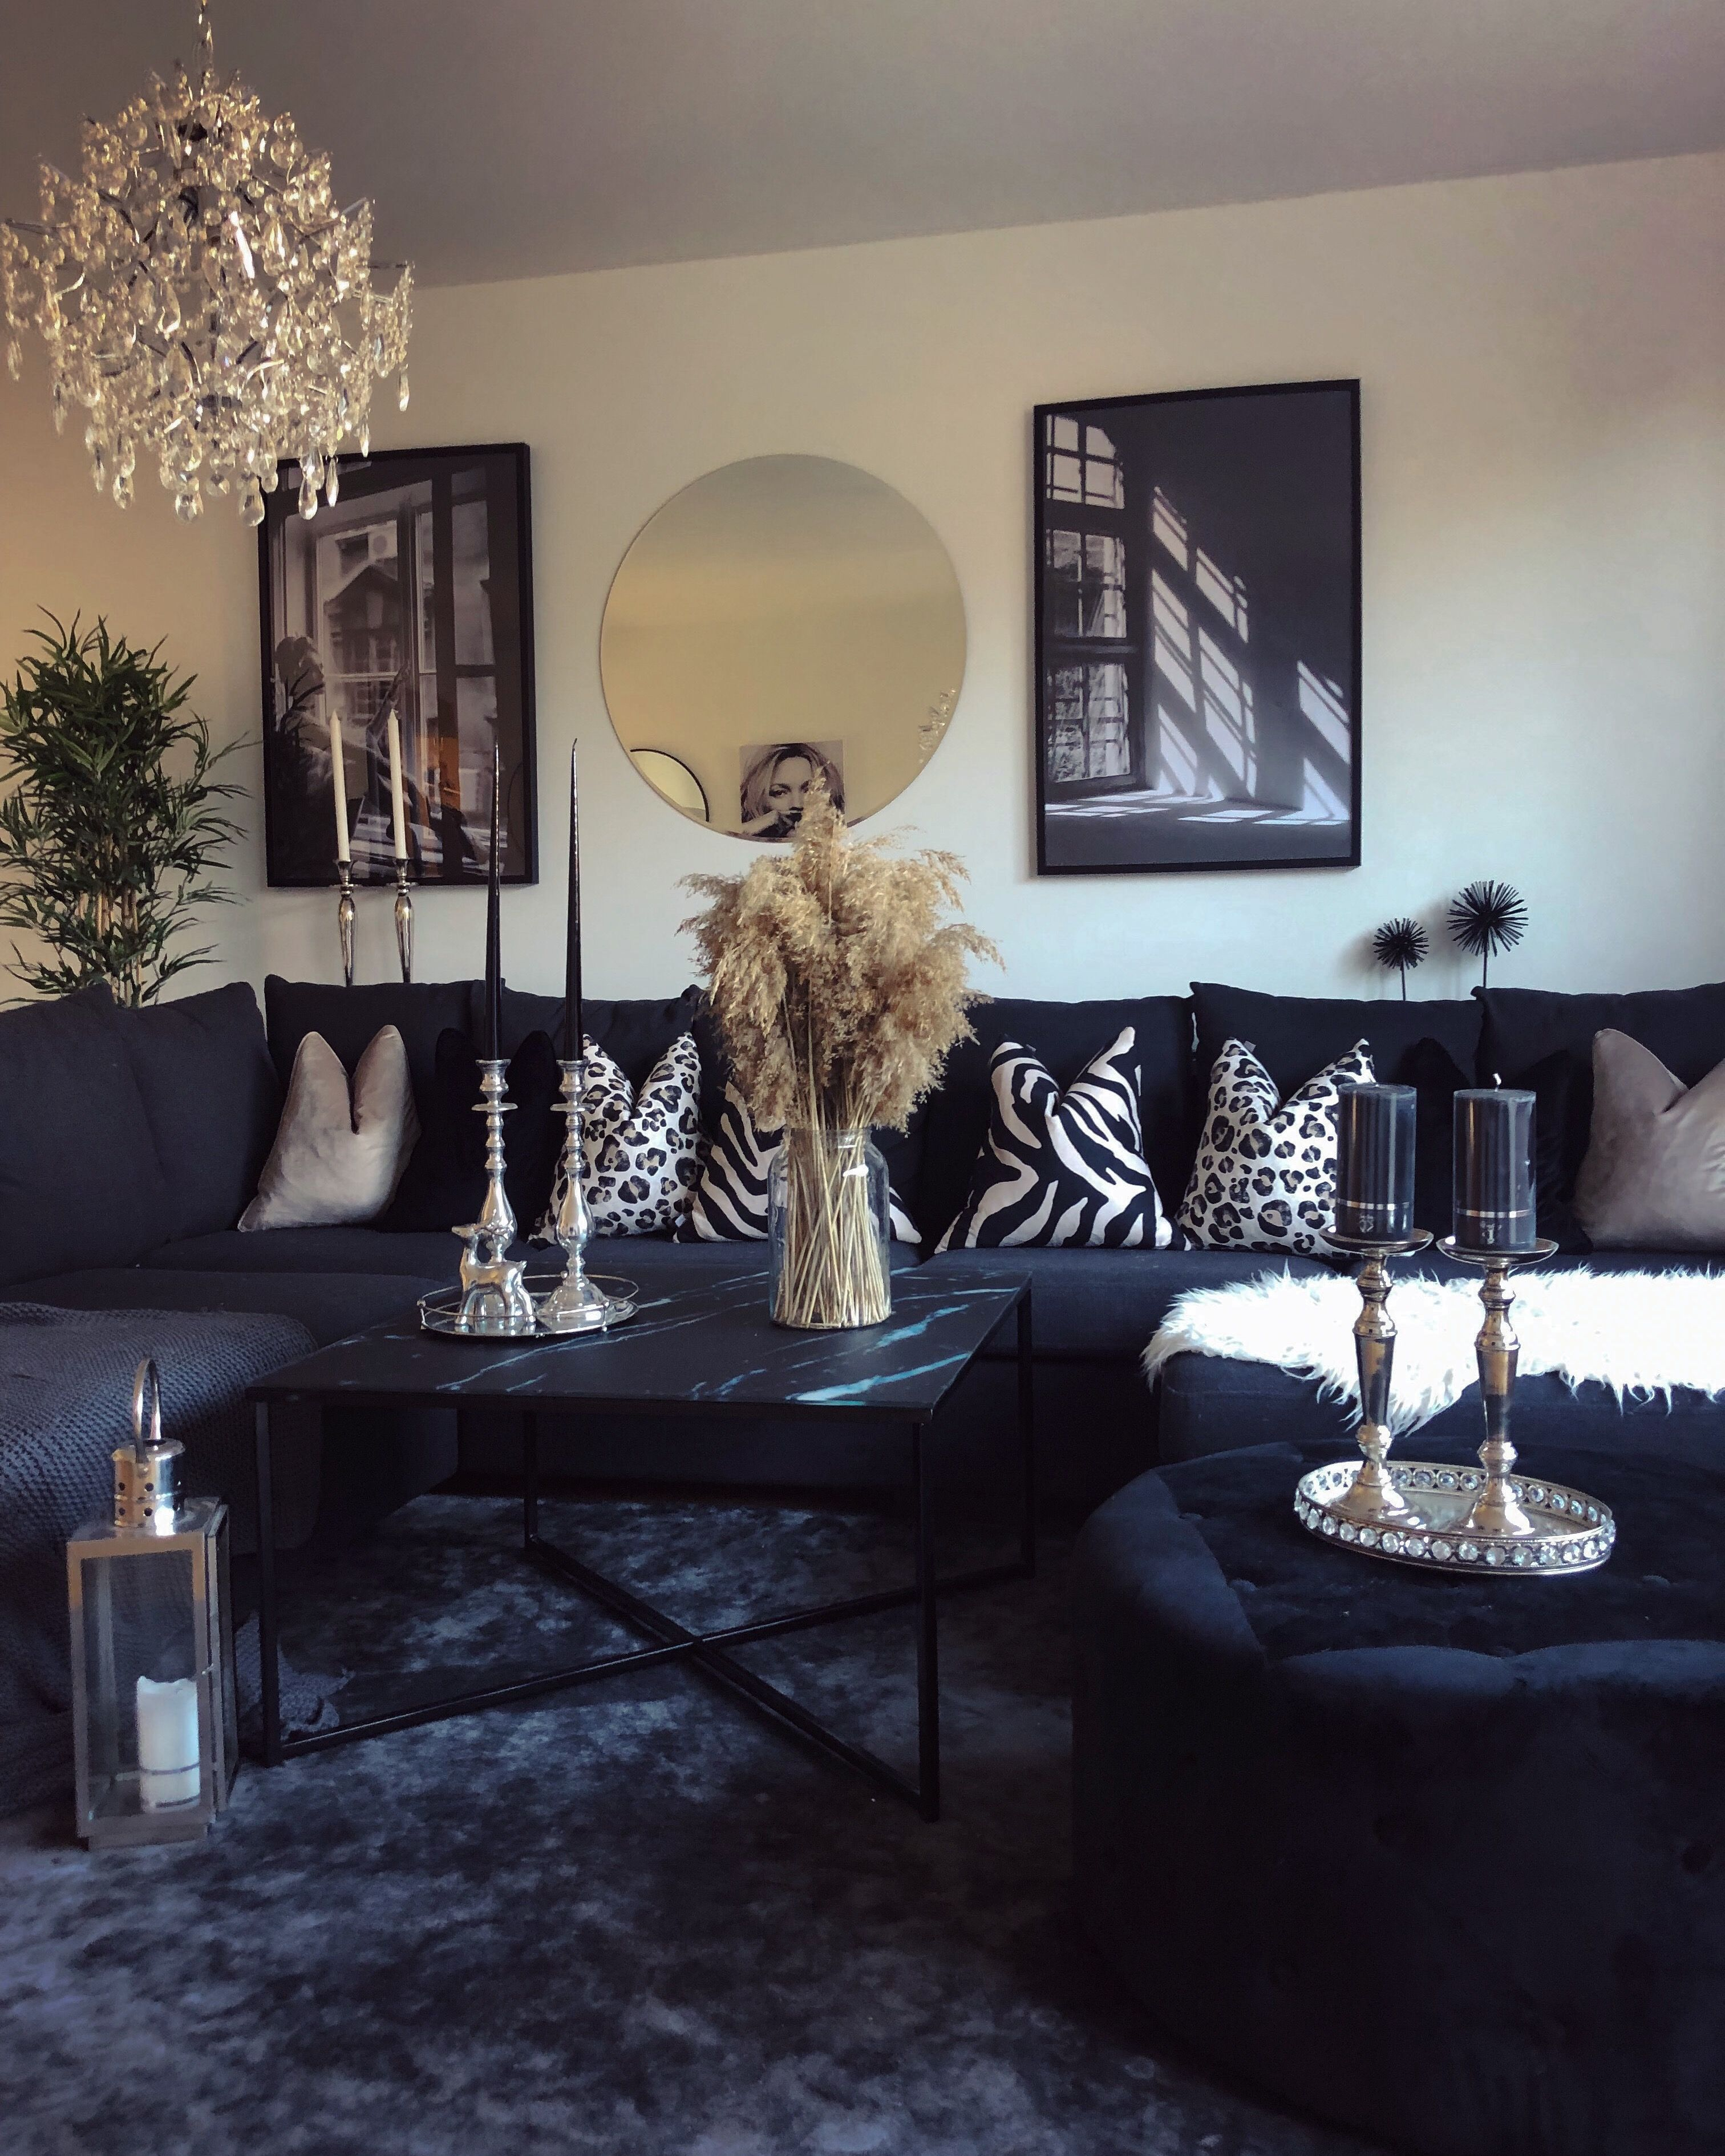 dekoration vardagsrum inspiration